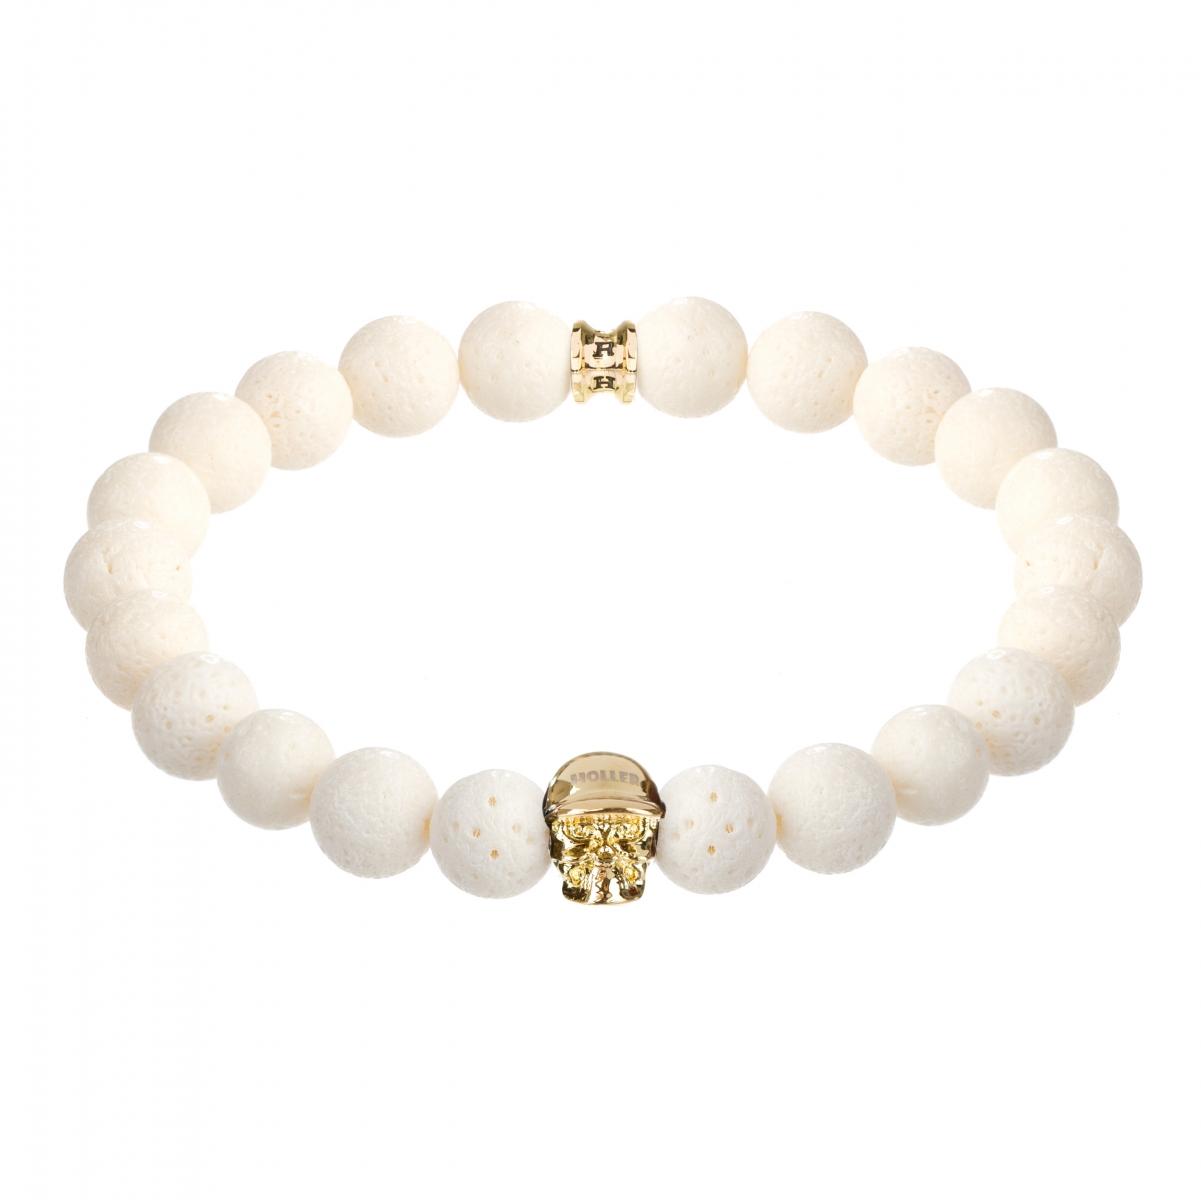 Jefferson Gold Polished Skull / 10mm White Coral Natural Stone Bracelet